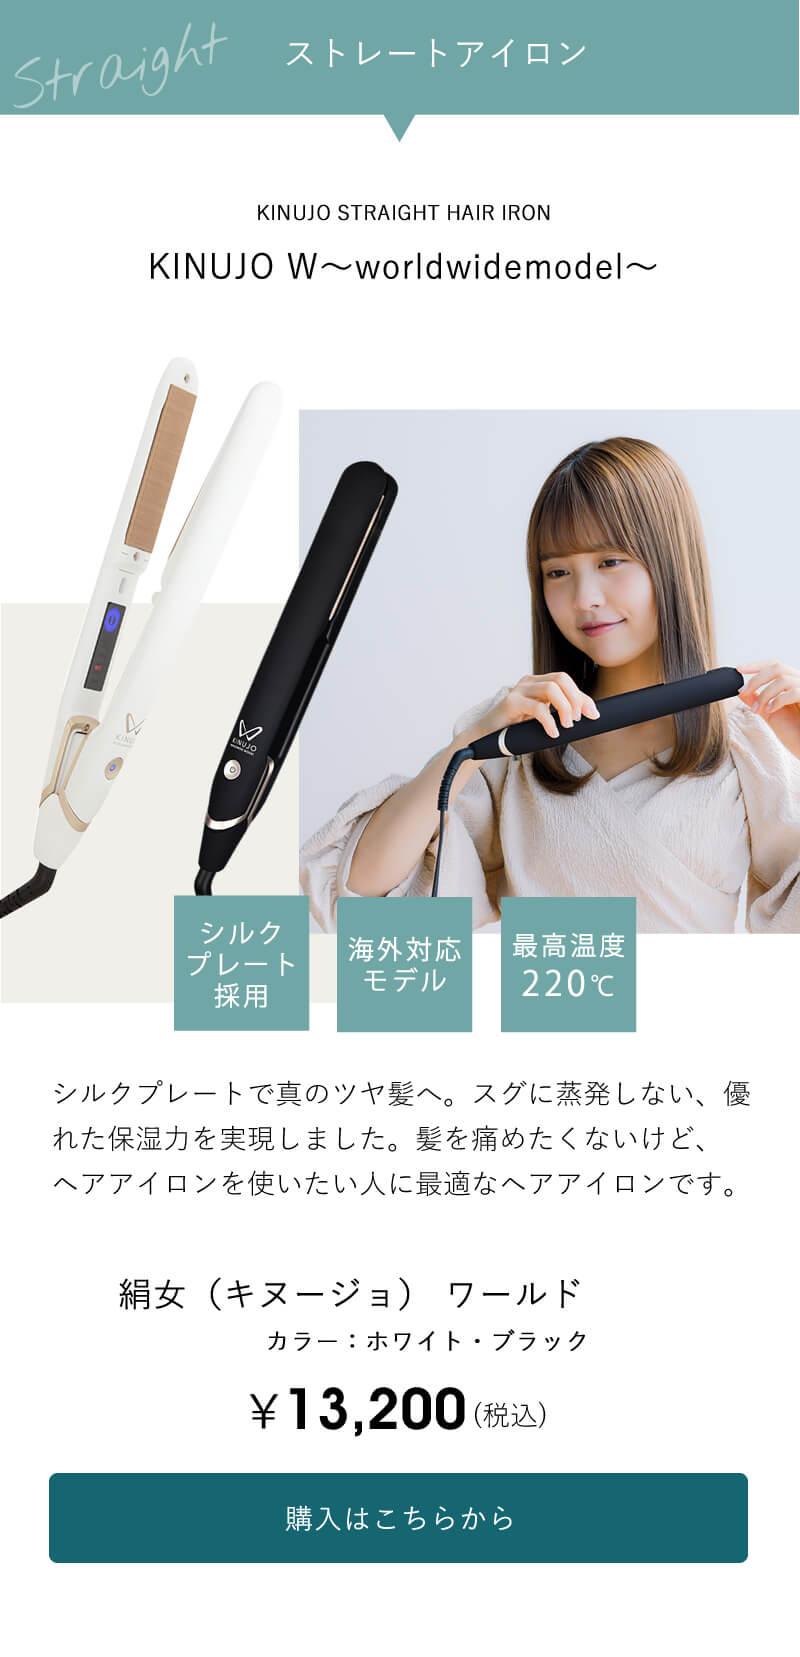 KINUJO 絹女 ワールド